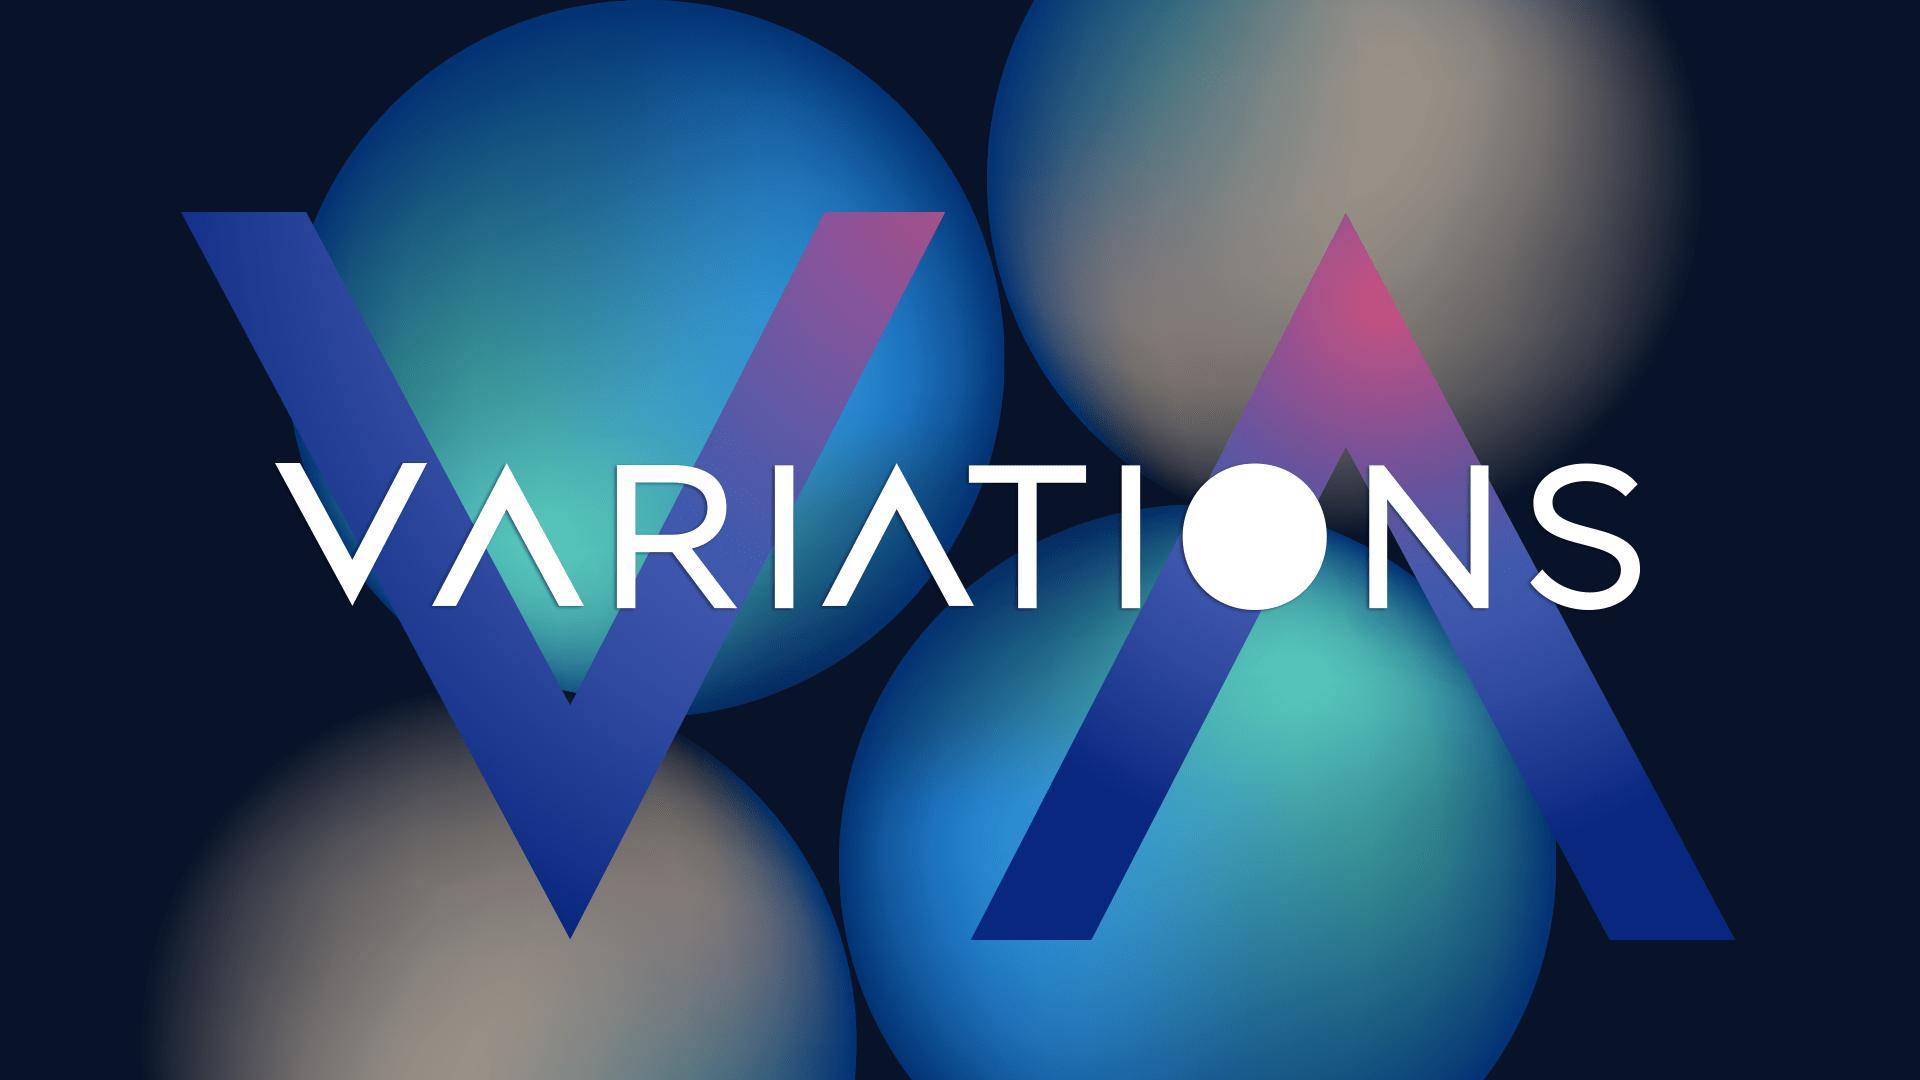 Variations saison 5 logo série musique